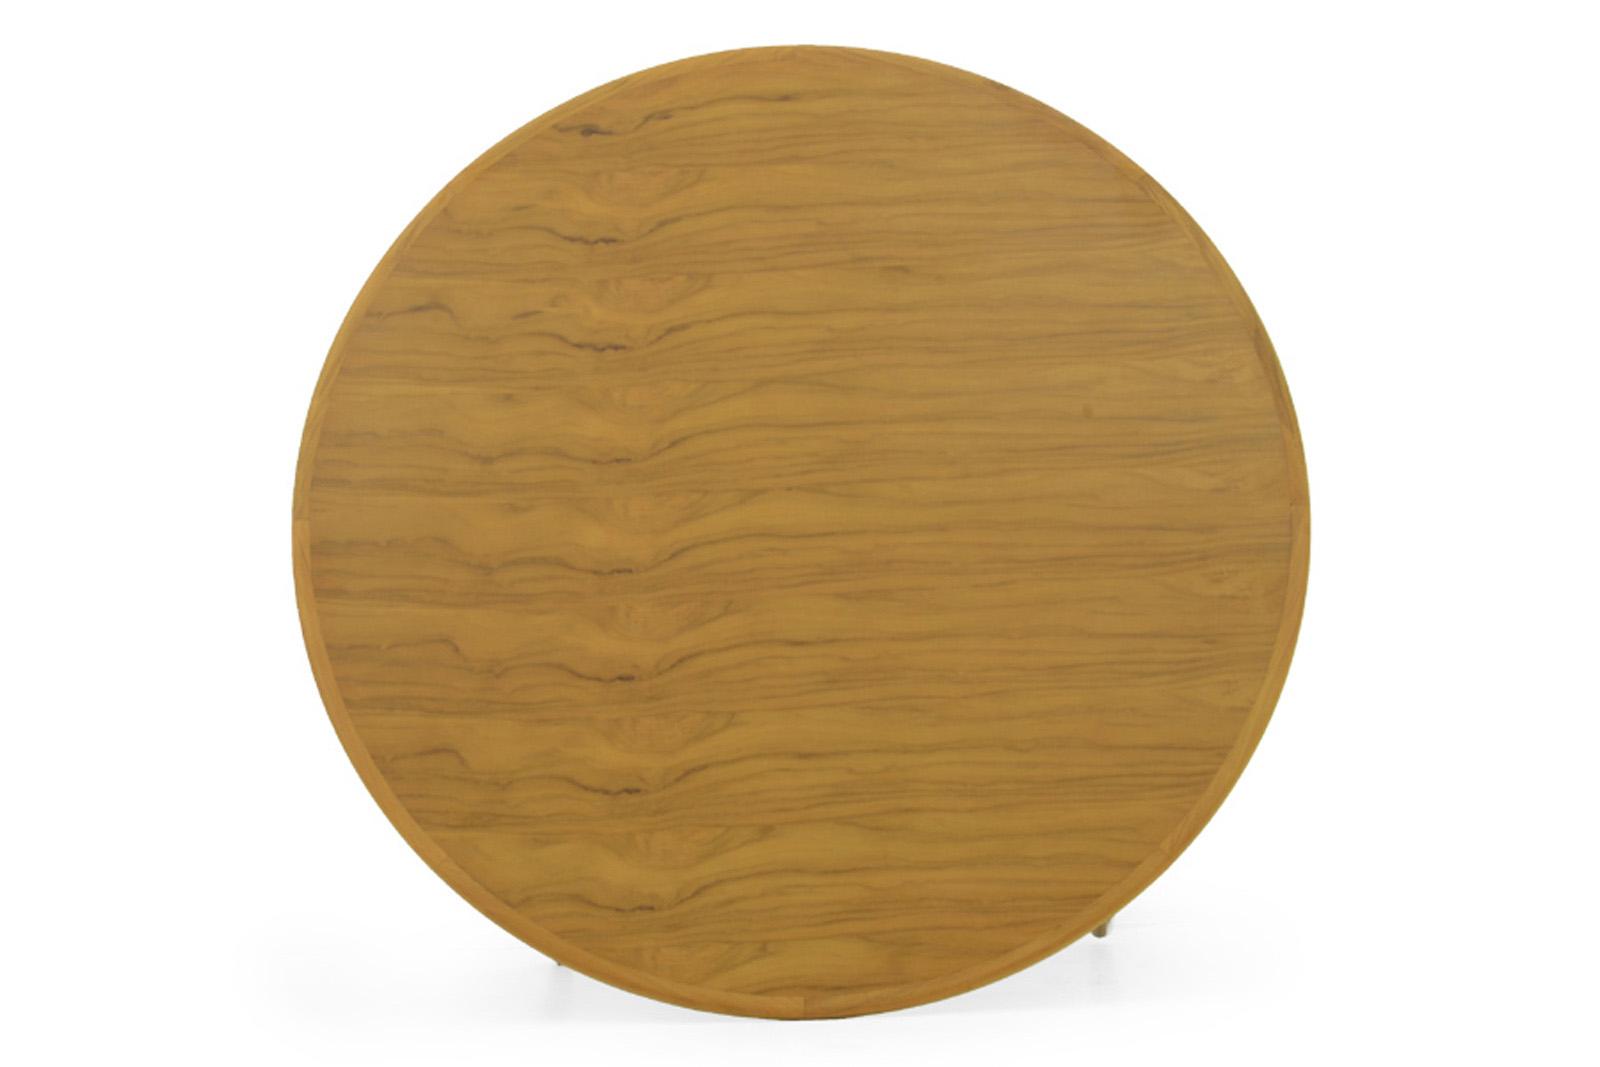 Foundation 円形ダイニングテーブル 115cm